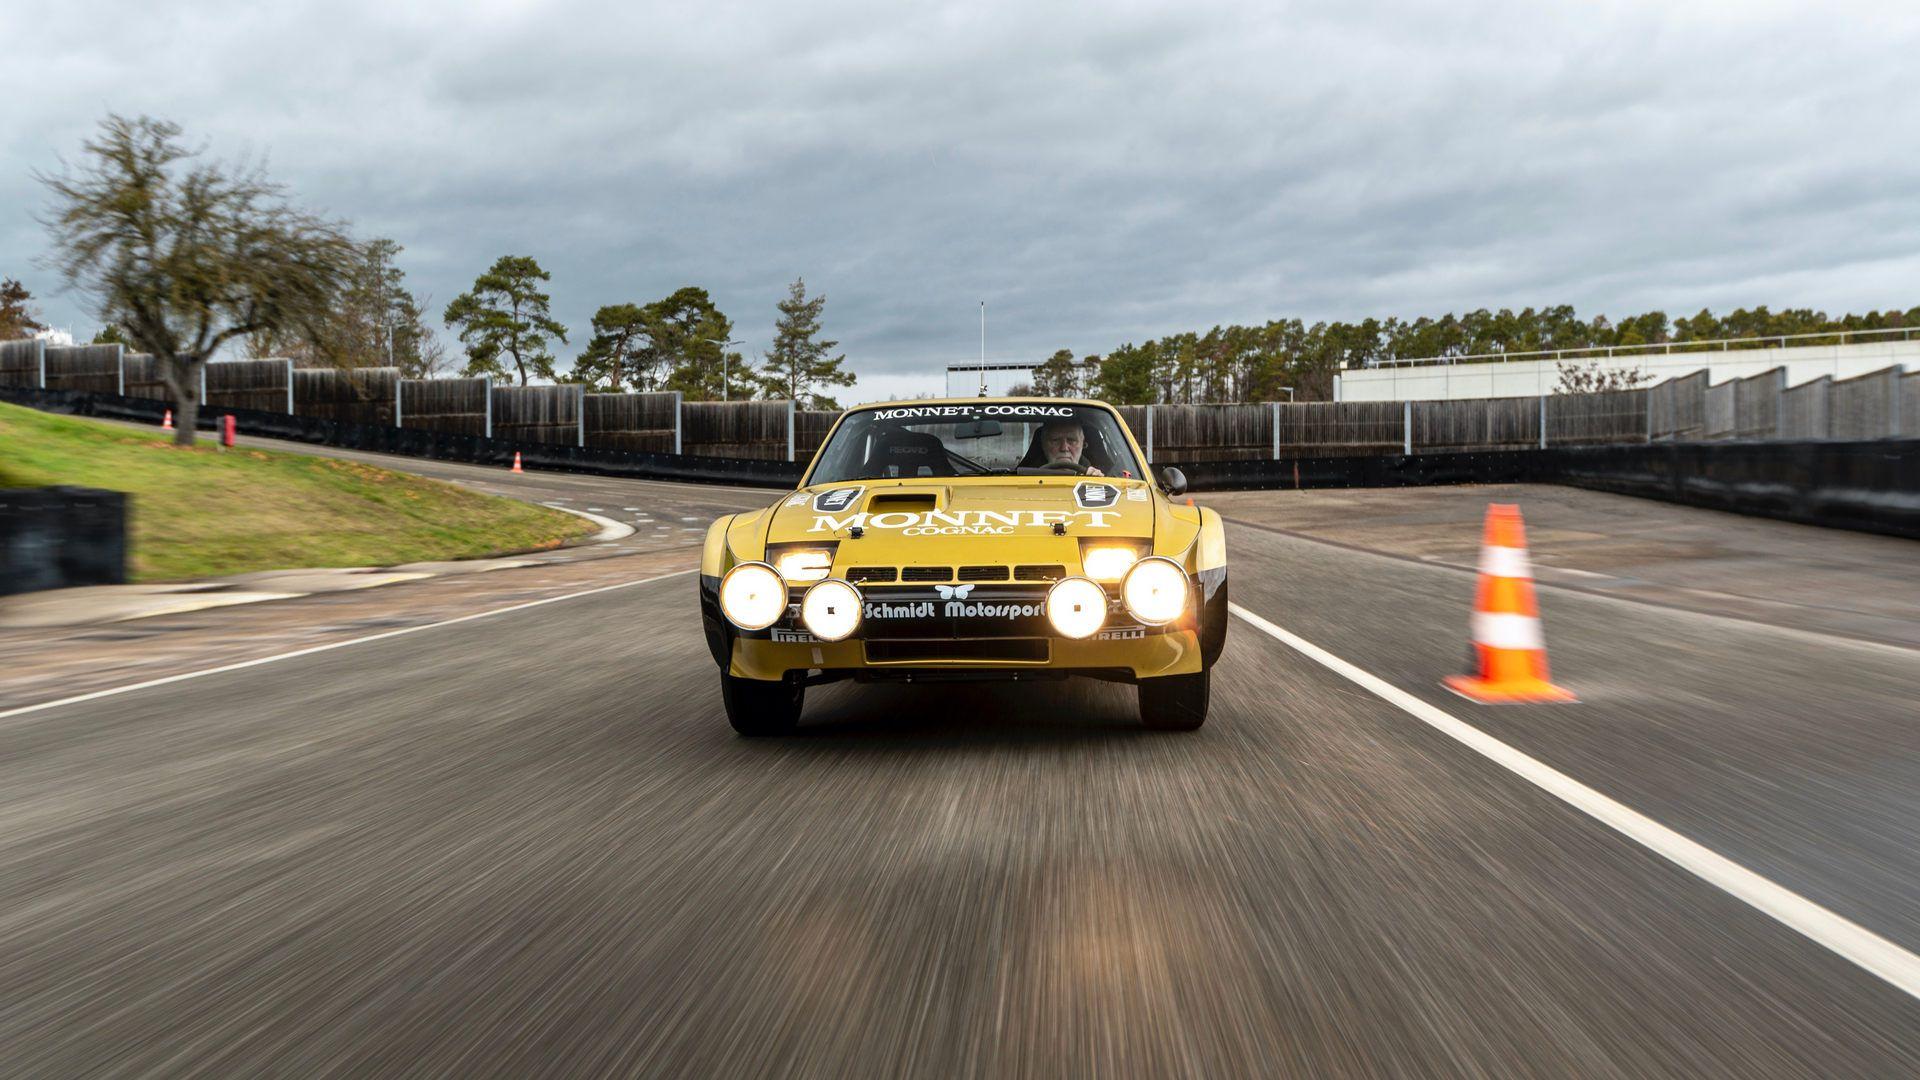 Porsche-924-Carrera-GTS-rally-car-Walter-Rohrl-5